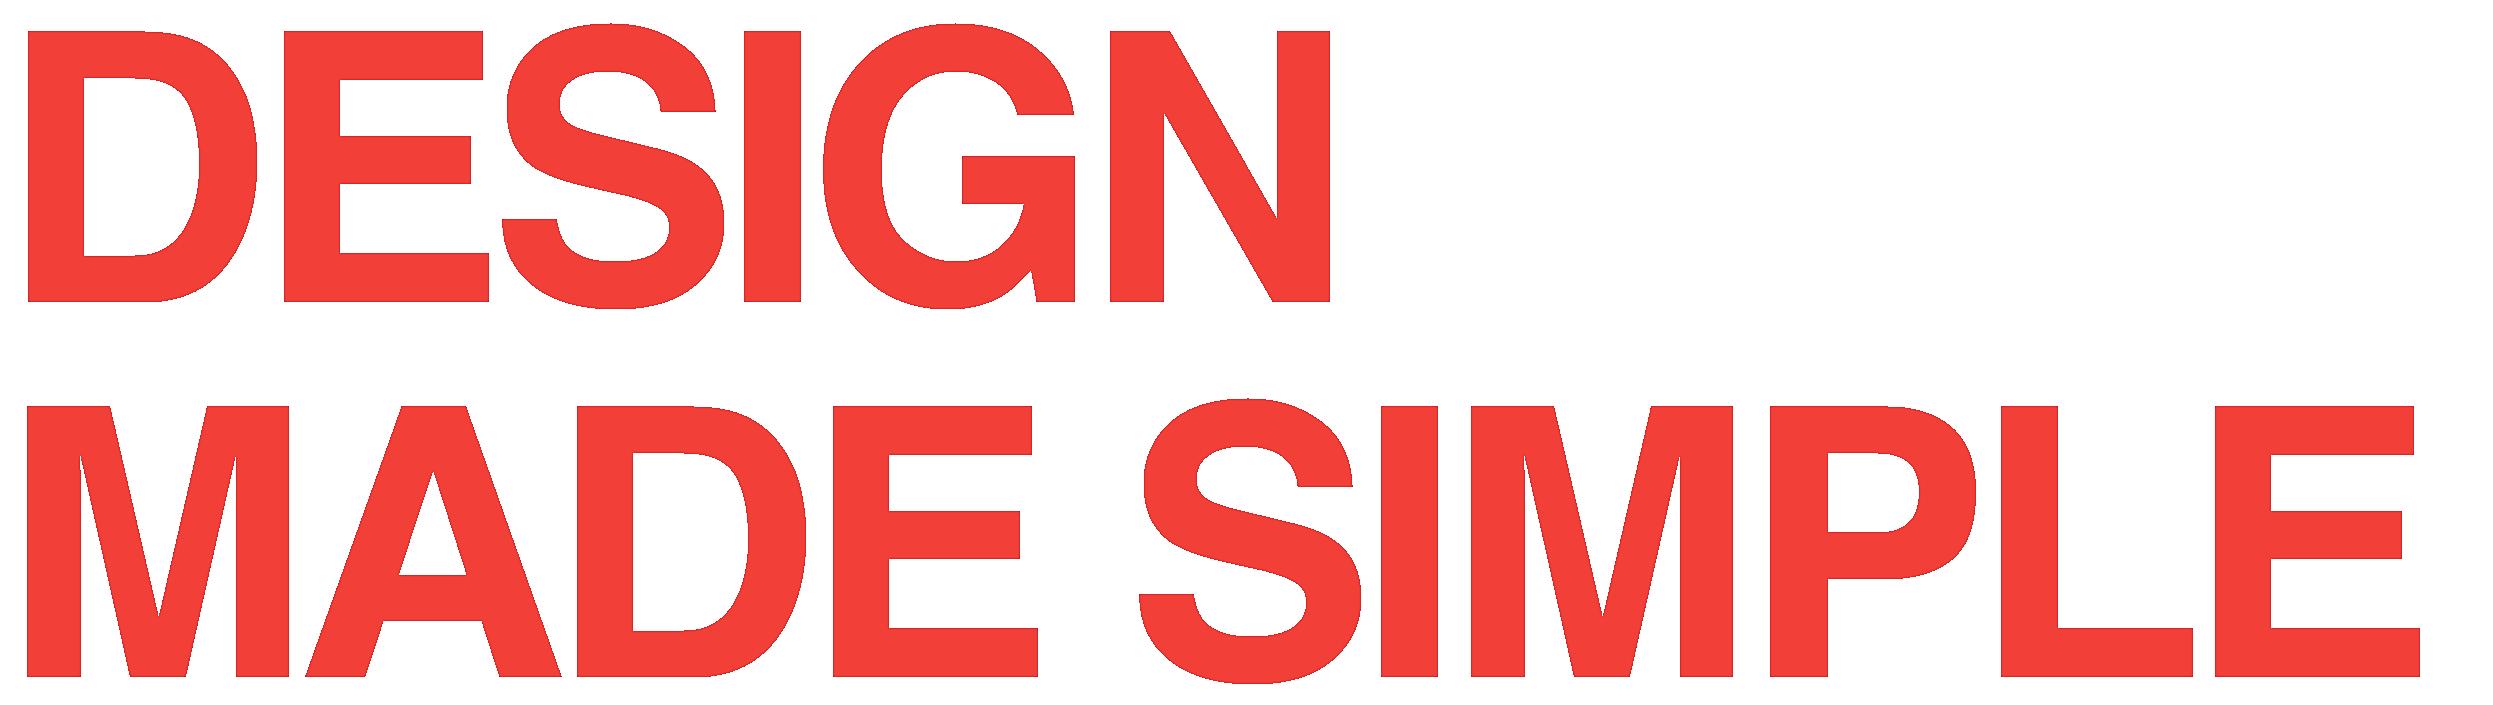 Hausman graphics graphic design agency glasgow scotland for Graphic design agency